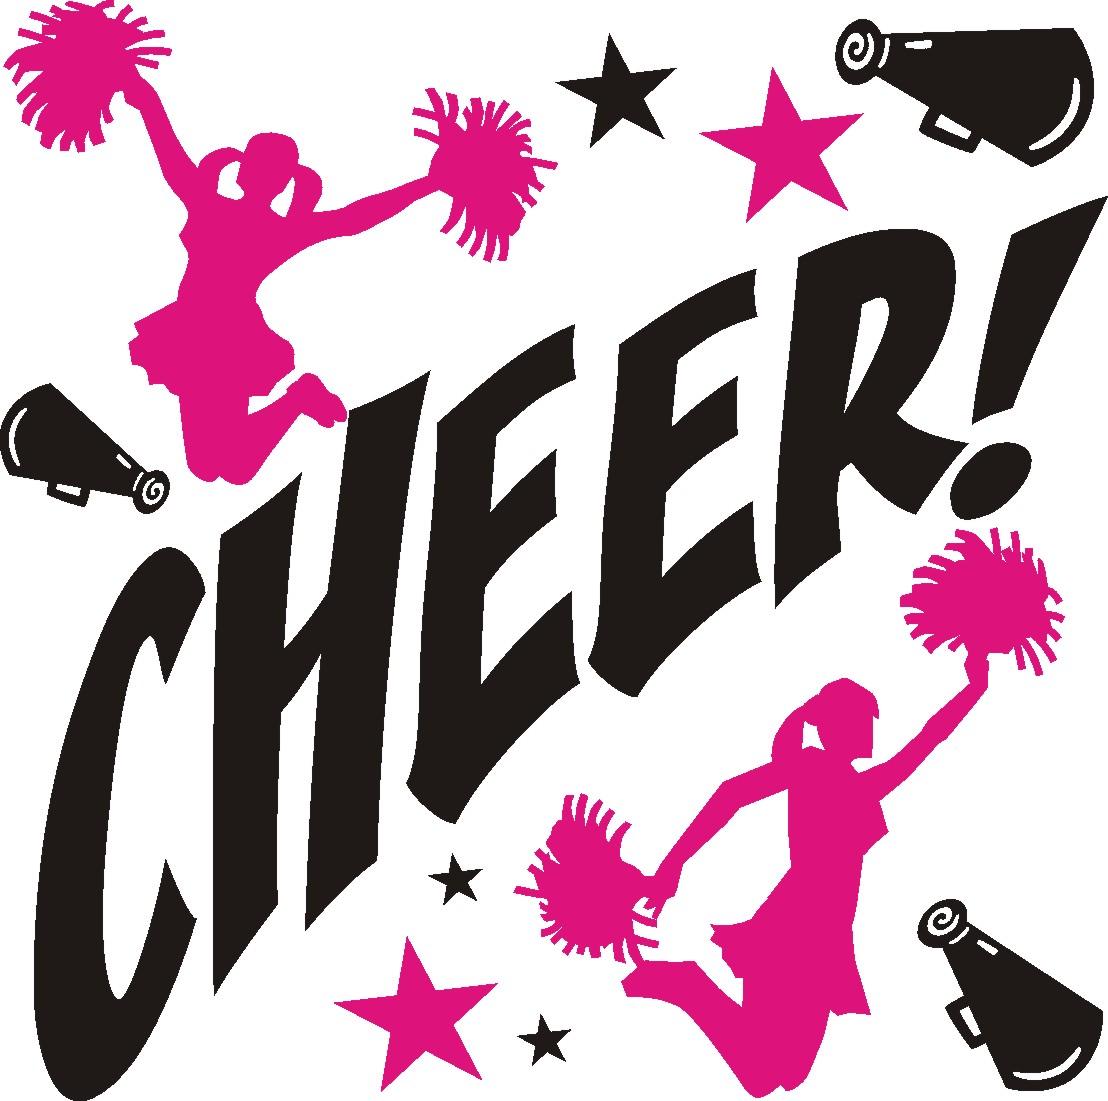 Free cheerleader clipart clip royalty free download Cheer Stunt Clipart | Free download best Cheer Stunt Clipart on ... clip royalty free download